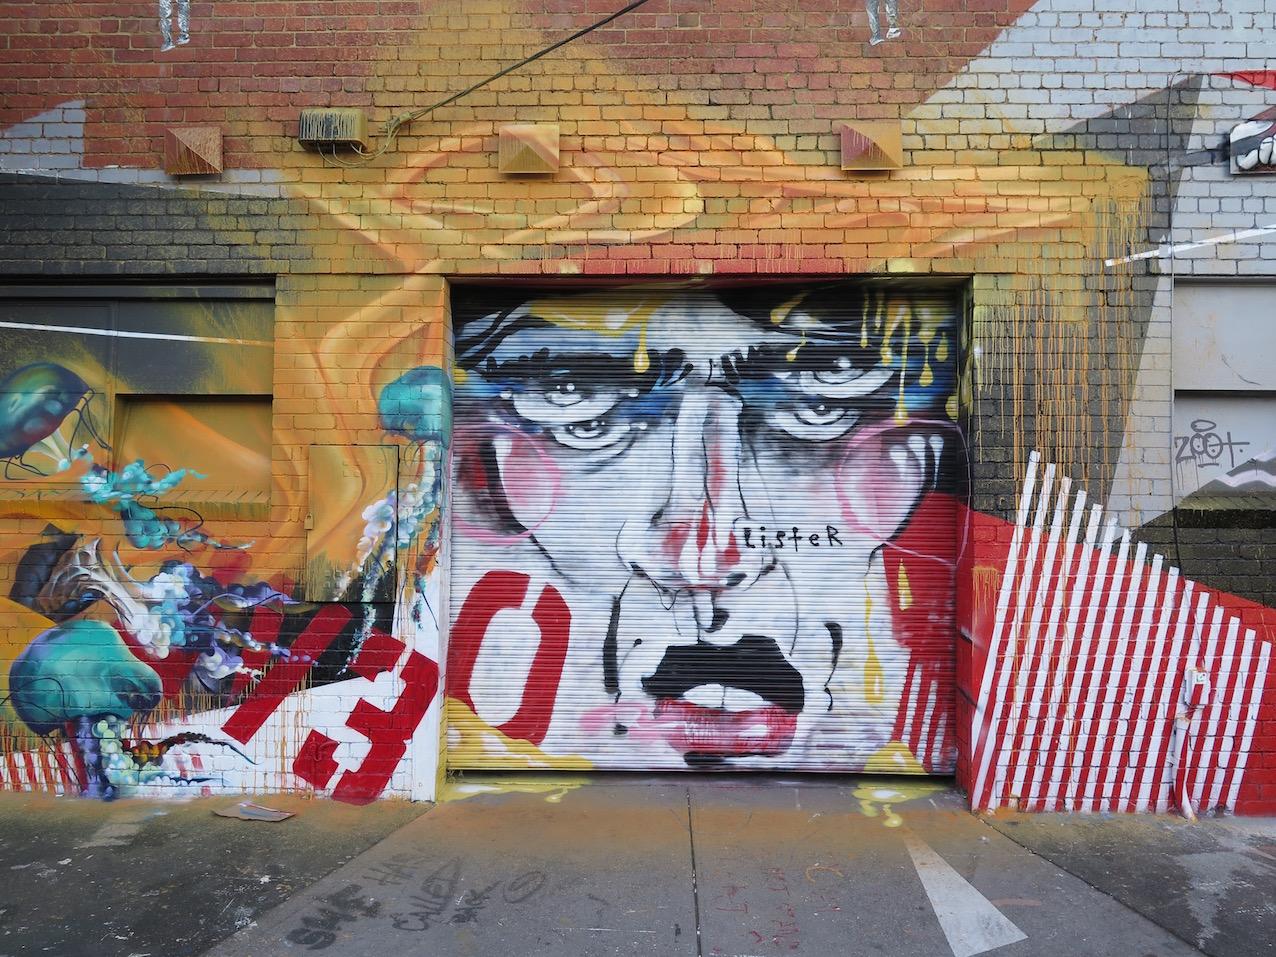 deansunshine_landofsunshine_melbourne_streetart_graffiti_lister does melb march 16 1